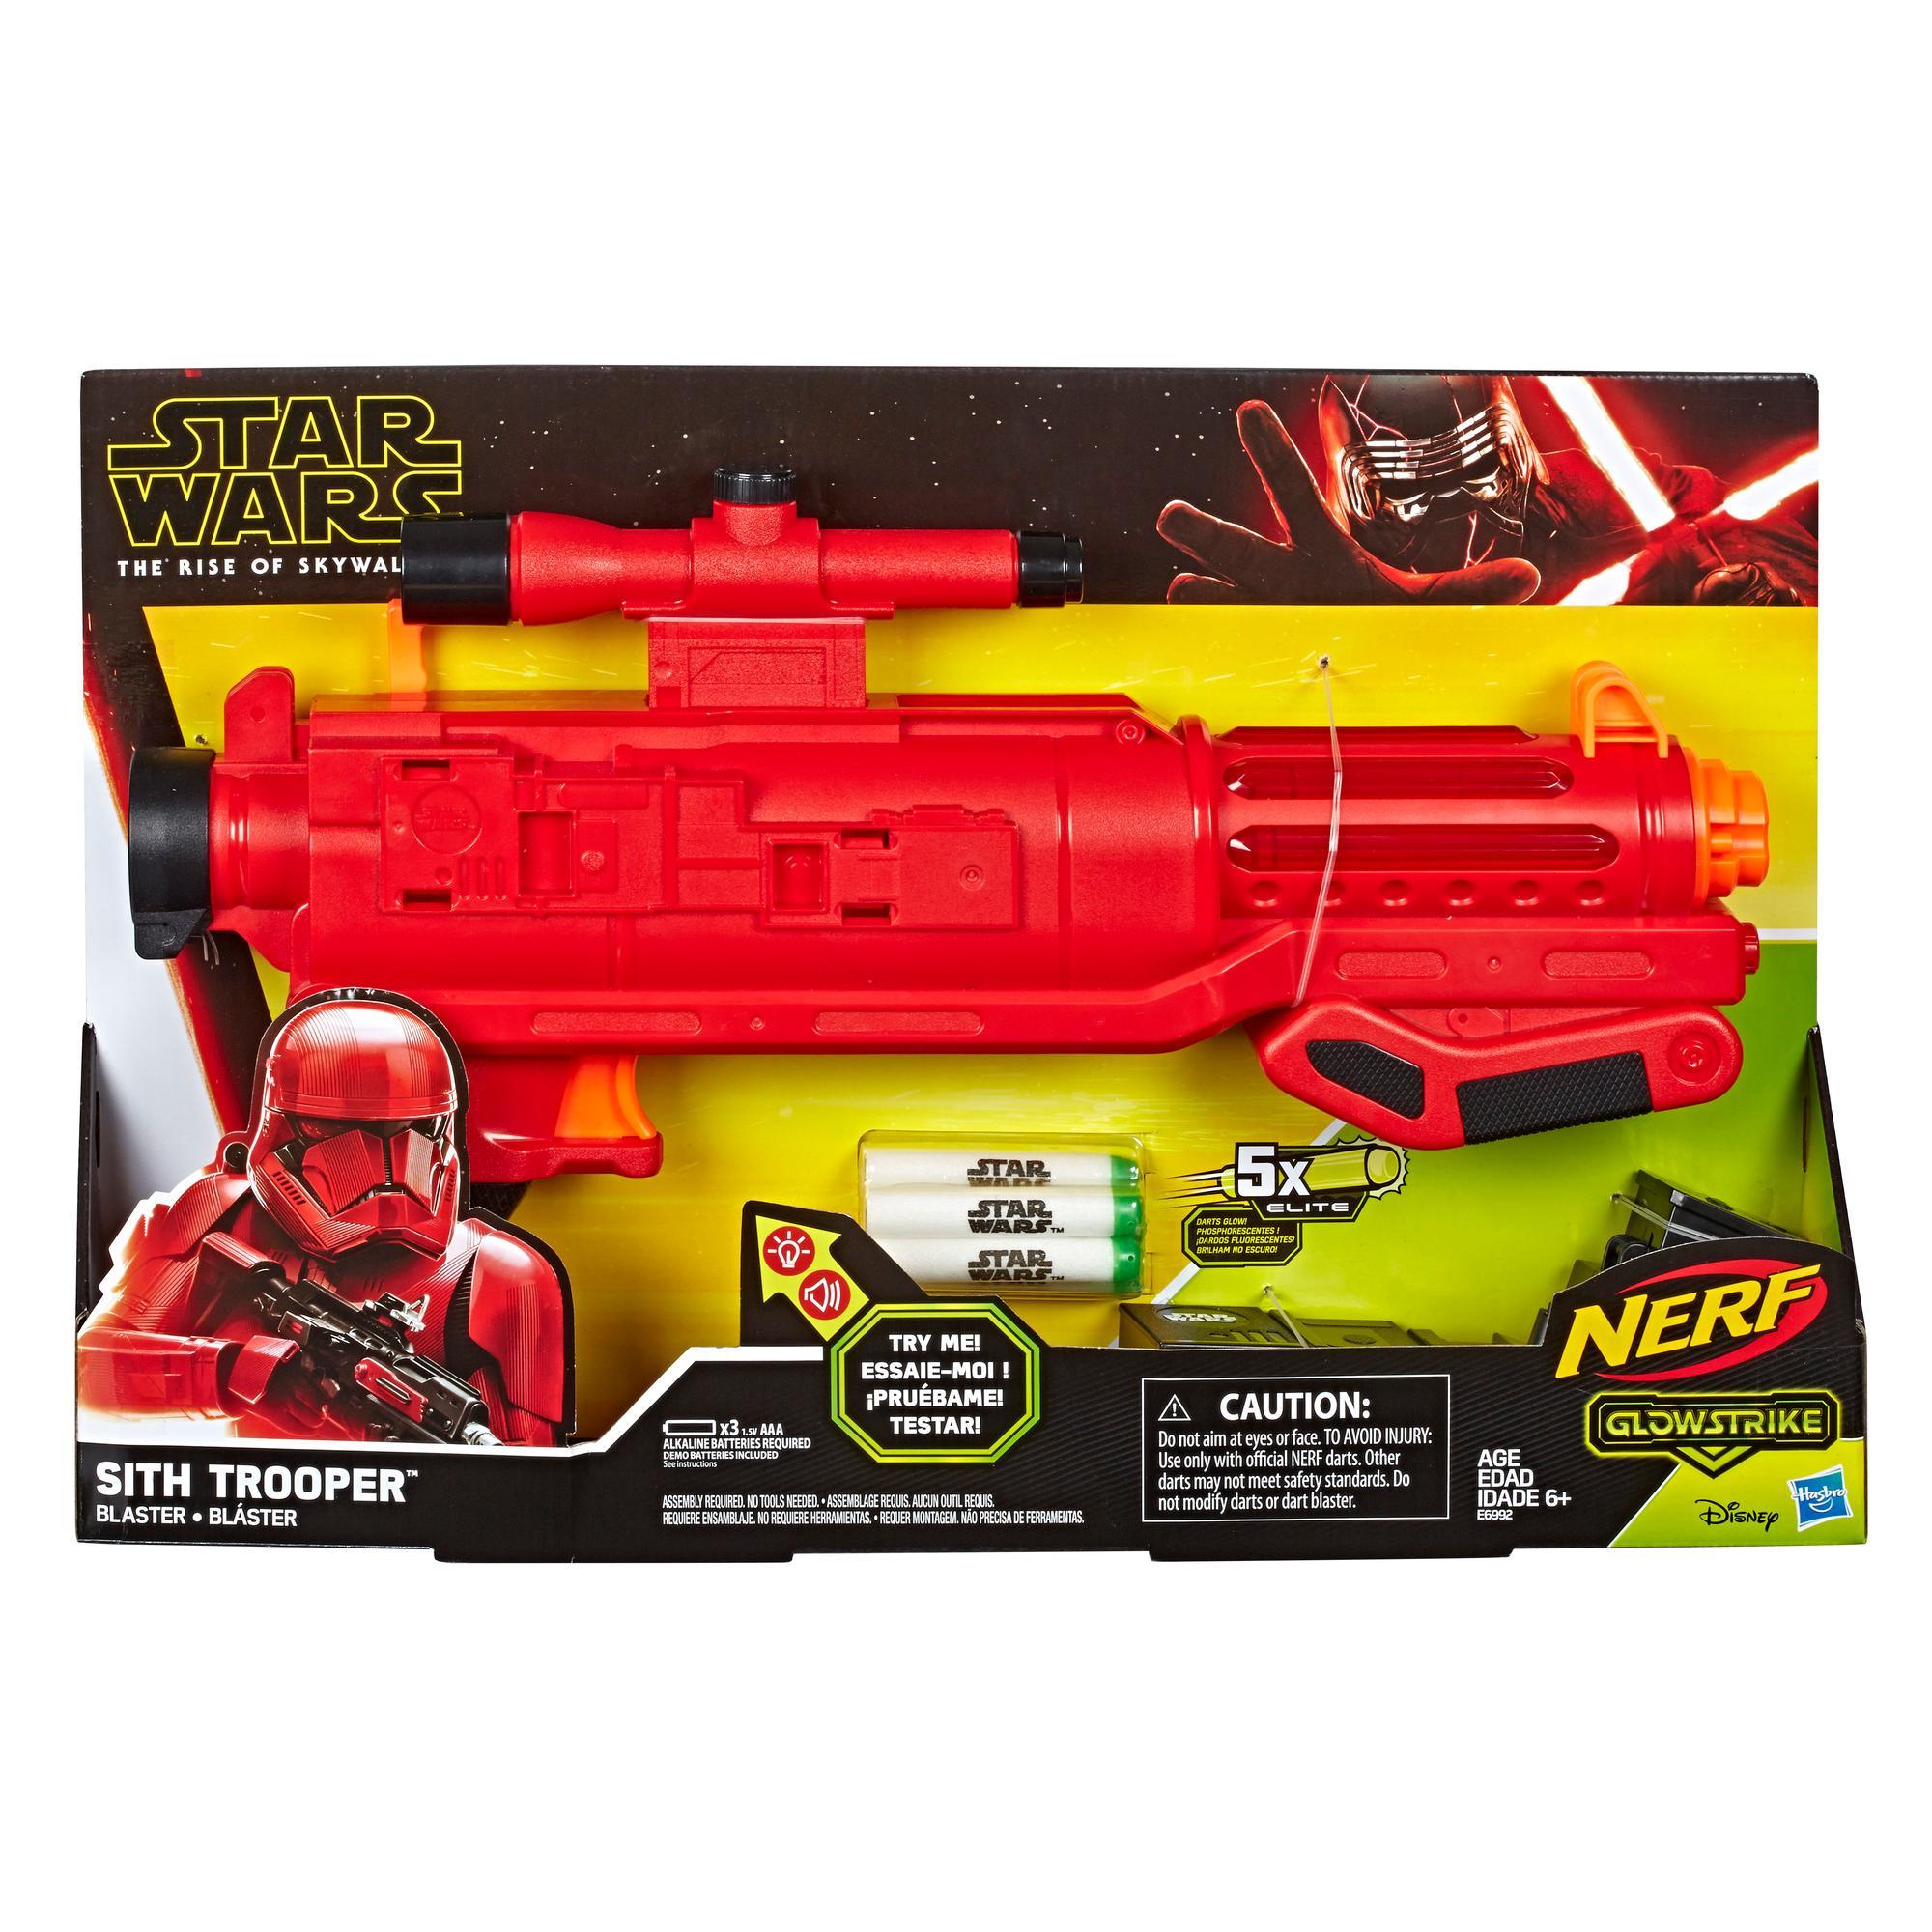 Nerf Star Wars Sith Trooper Blaster